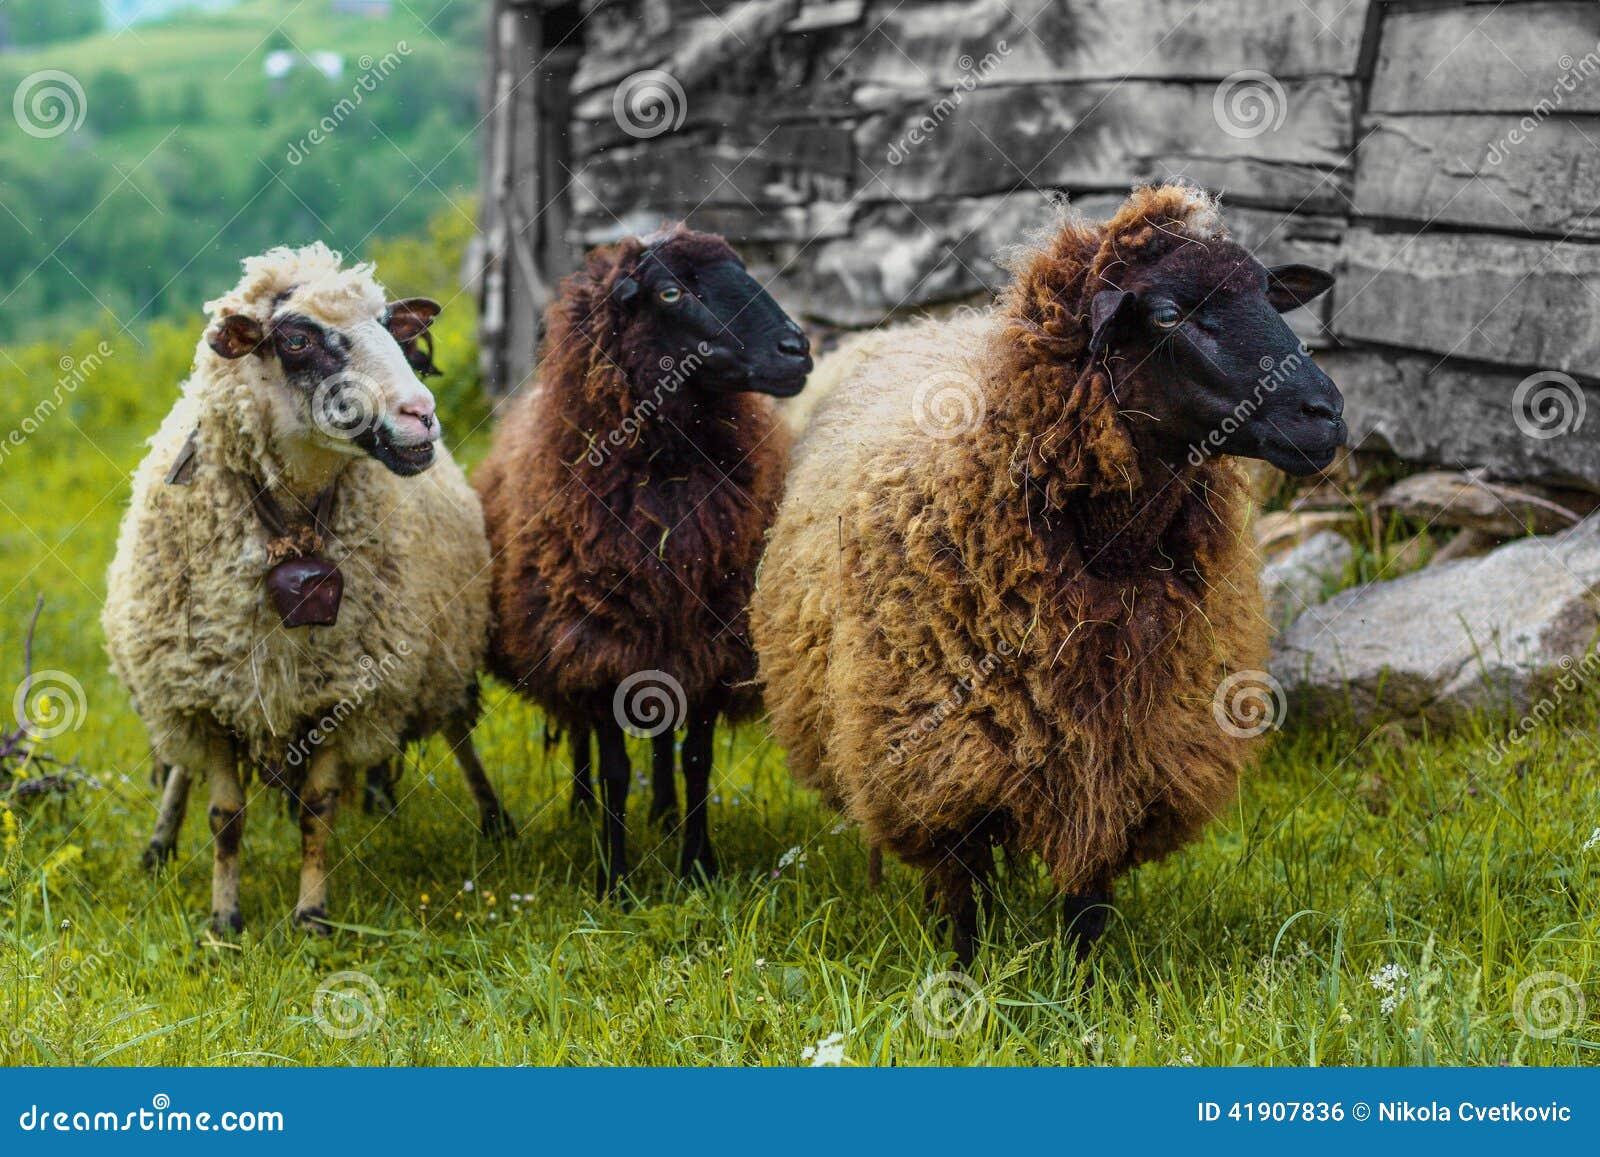 Three sheep - photo#14